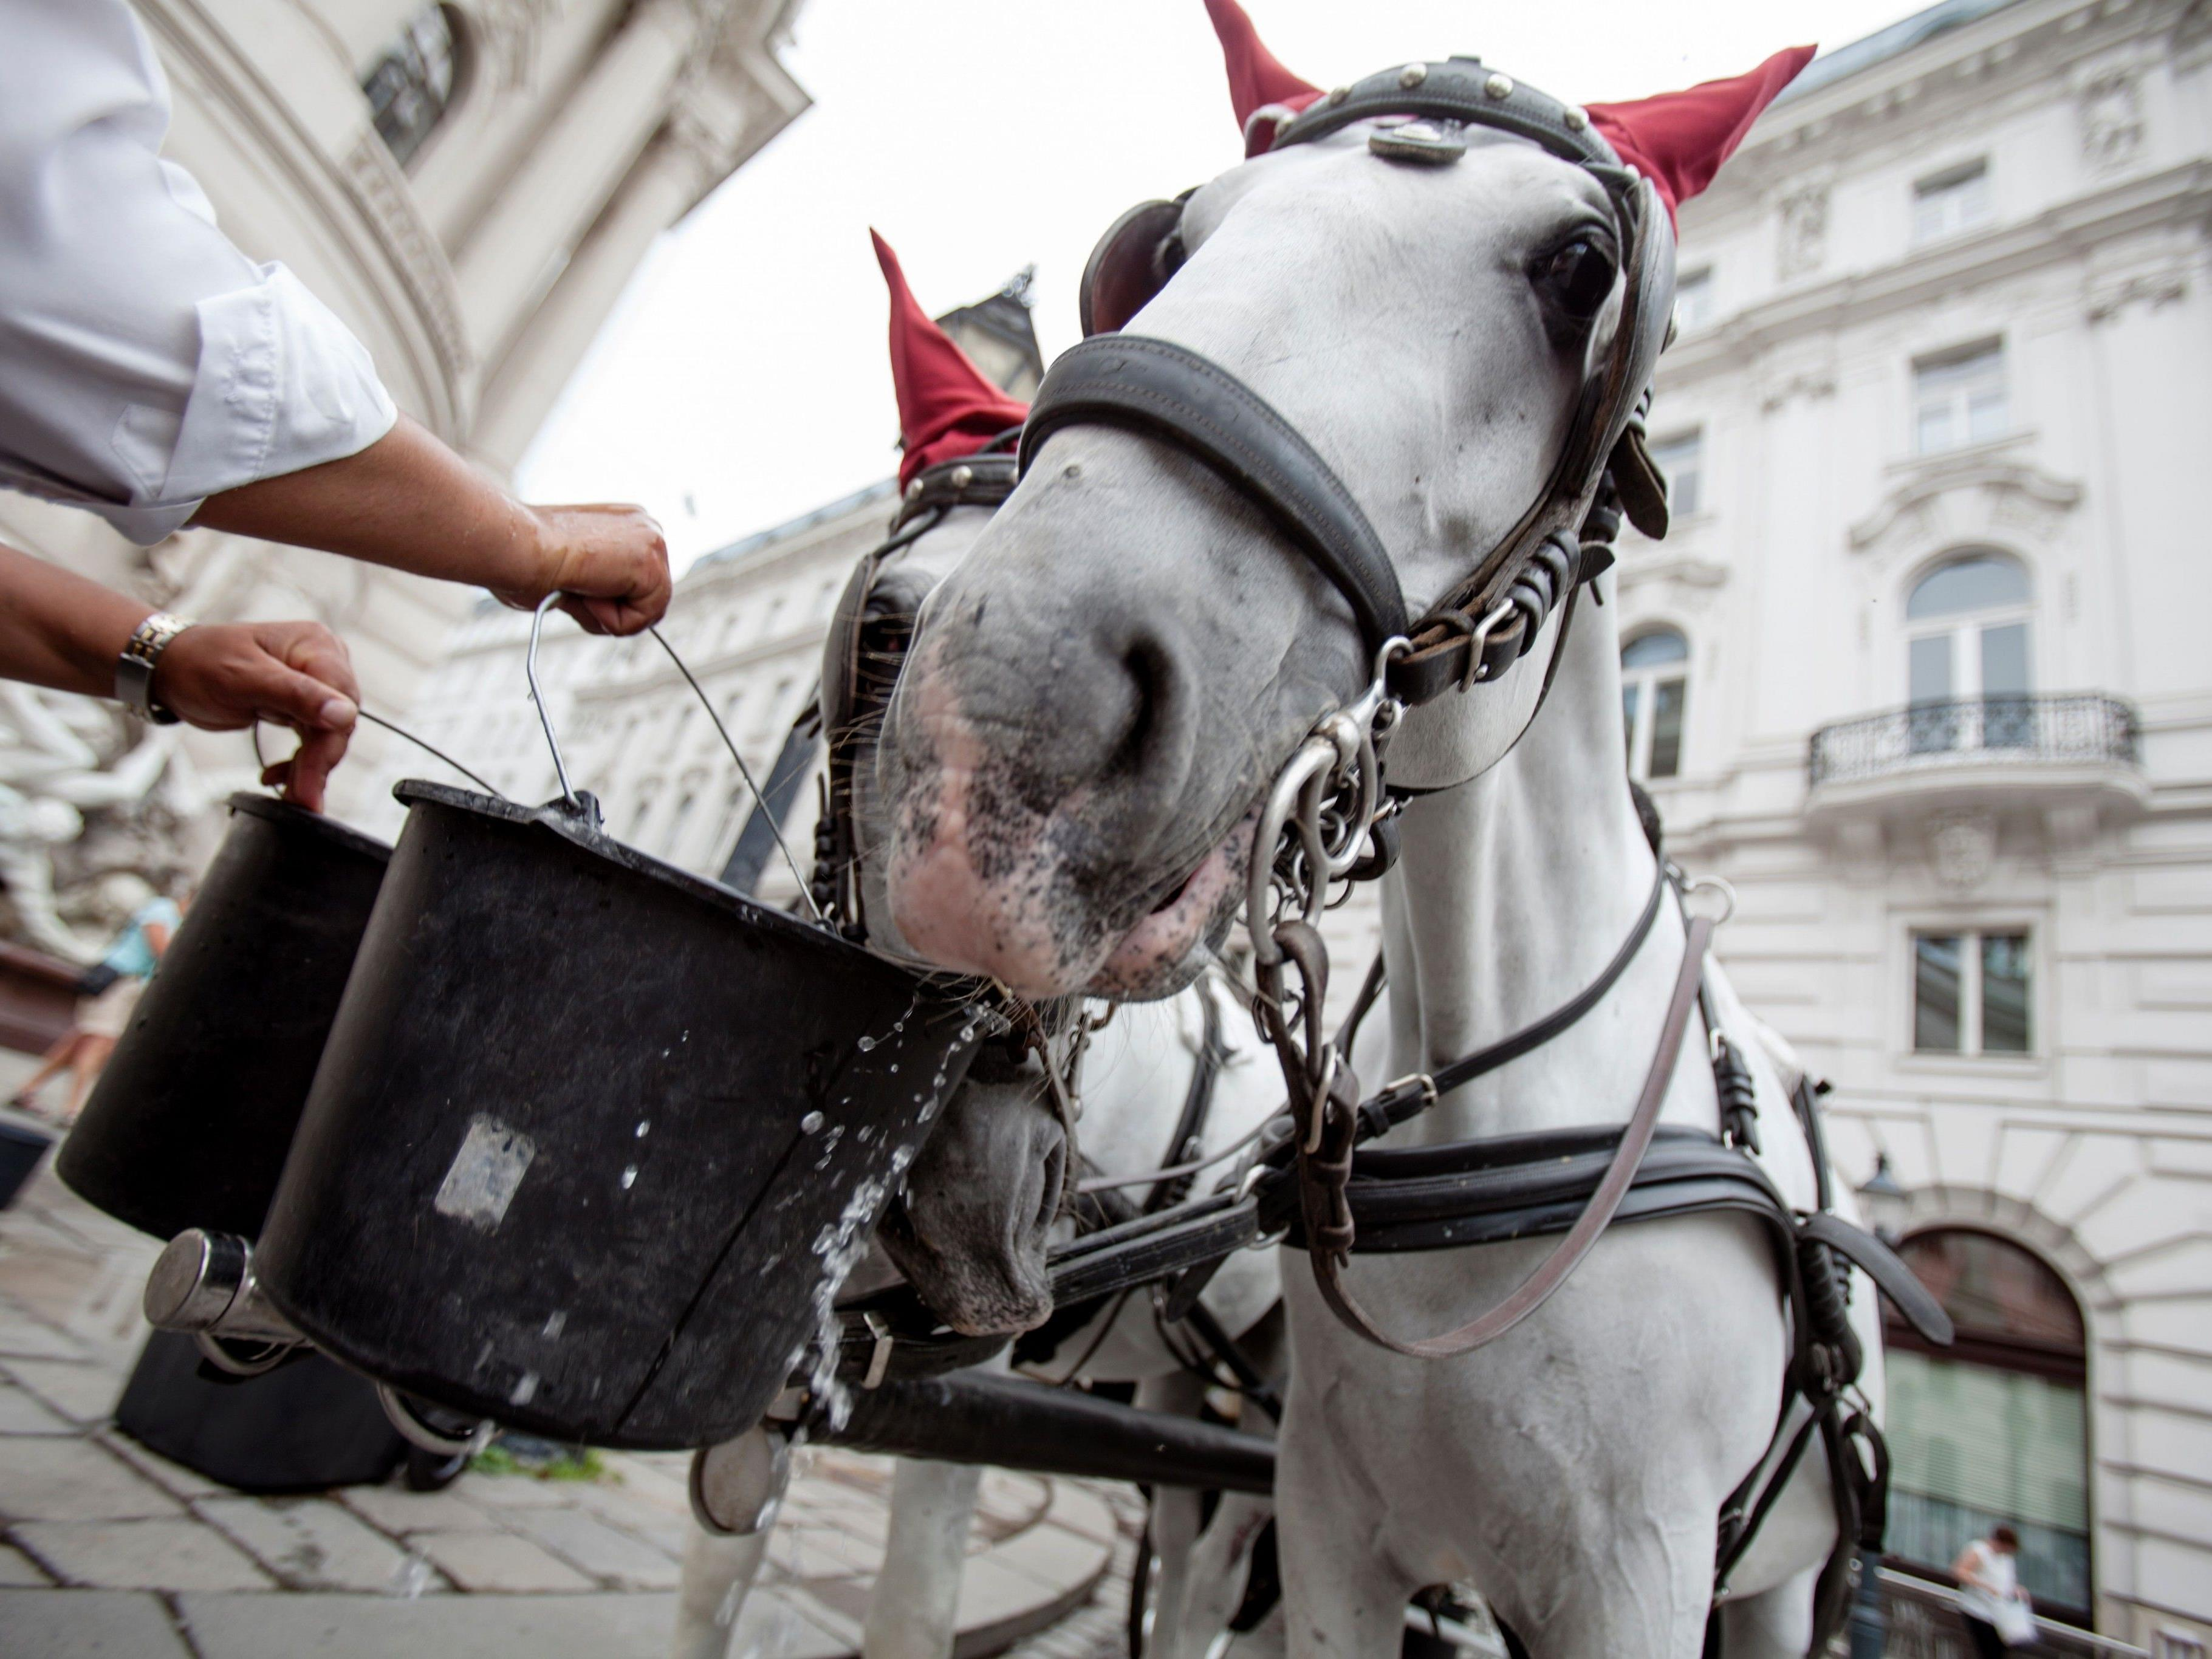 Wiens Fiaker-Pferde bekamen am Donnerstag nicht hitzefrei.